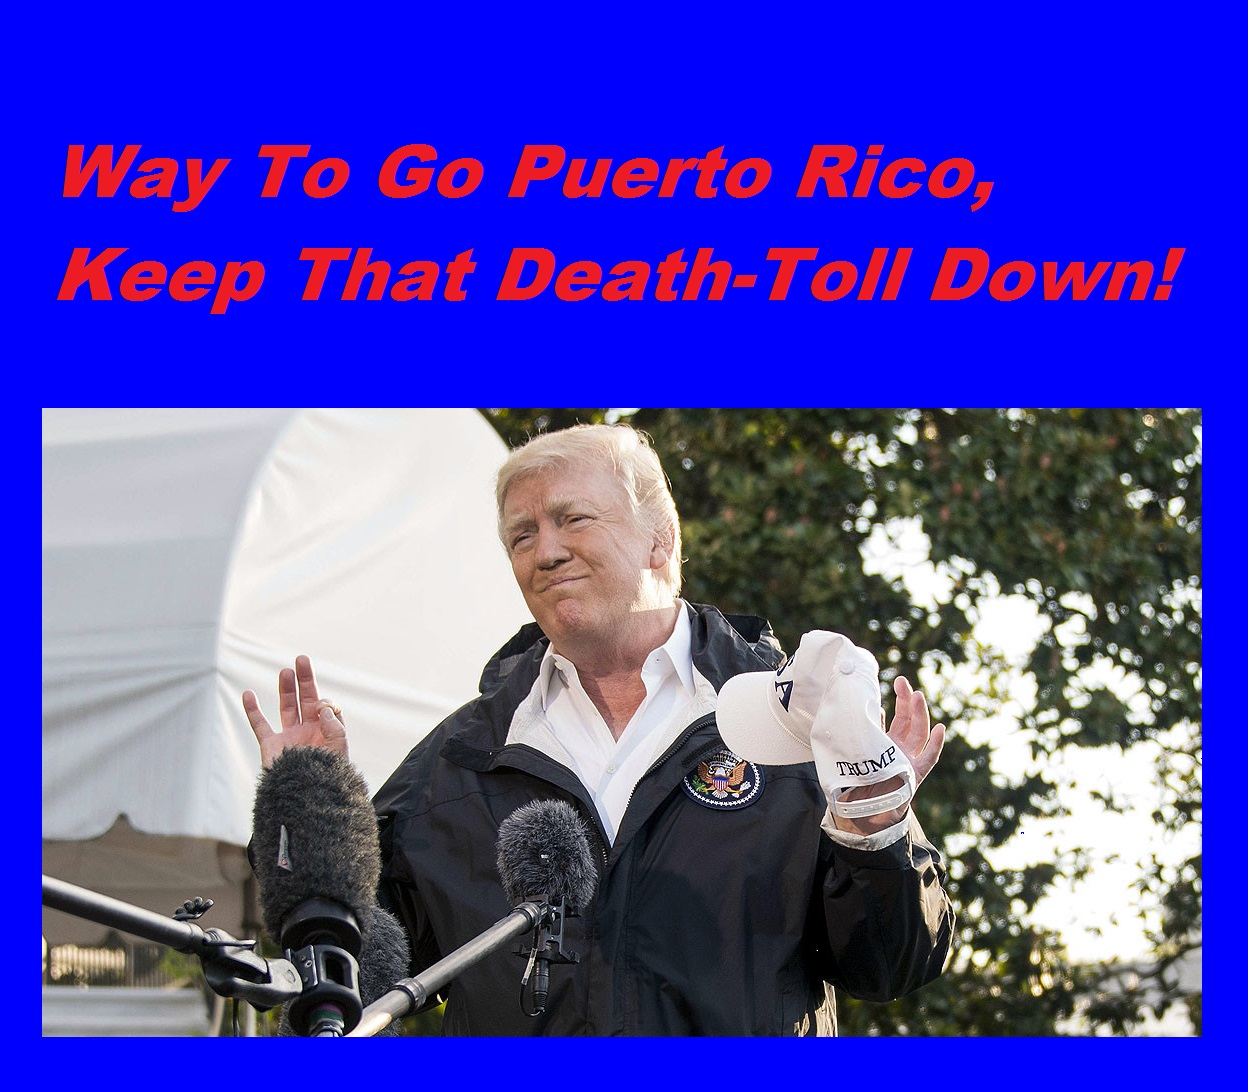 Trump in Puerto Rico j.jpg